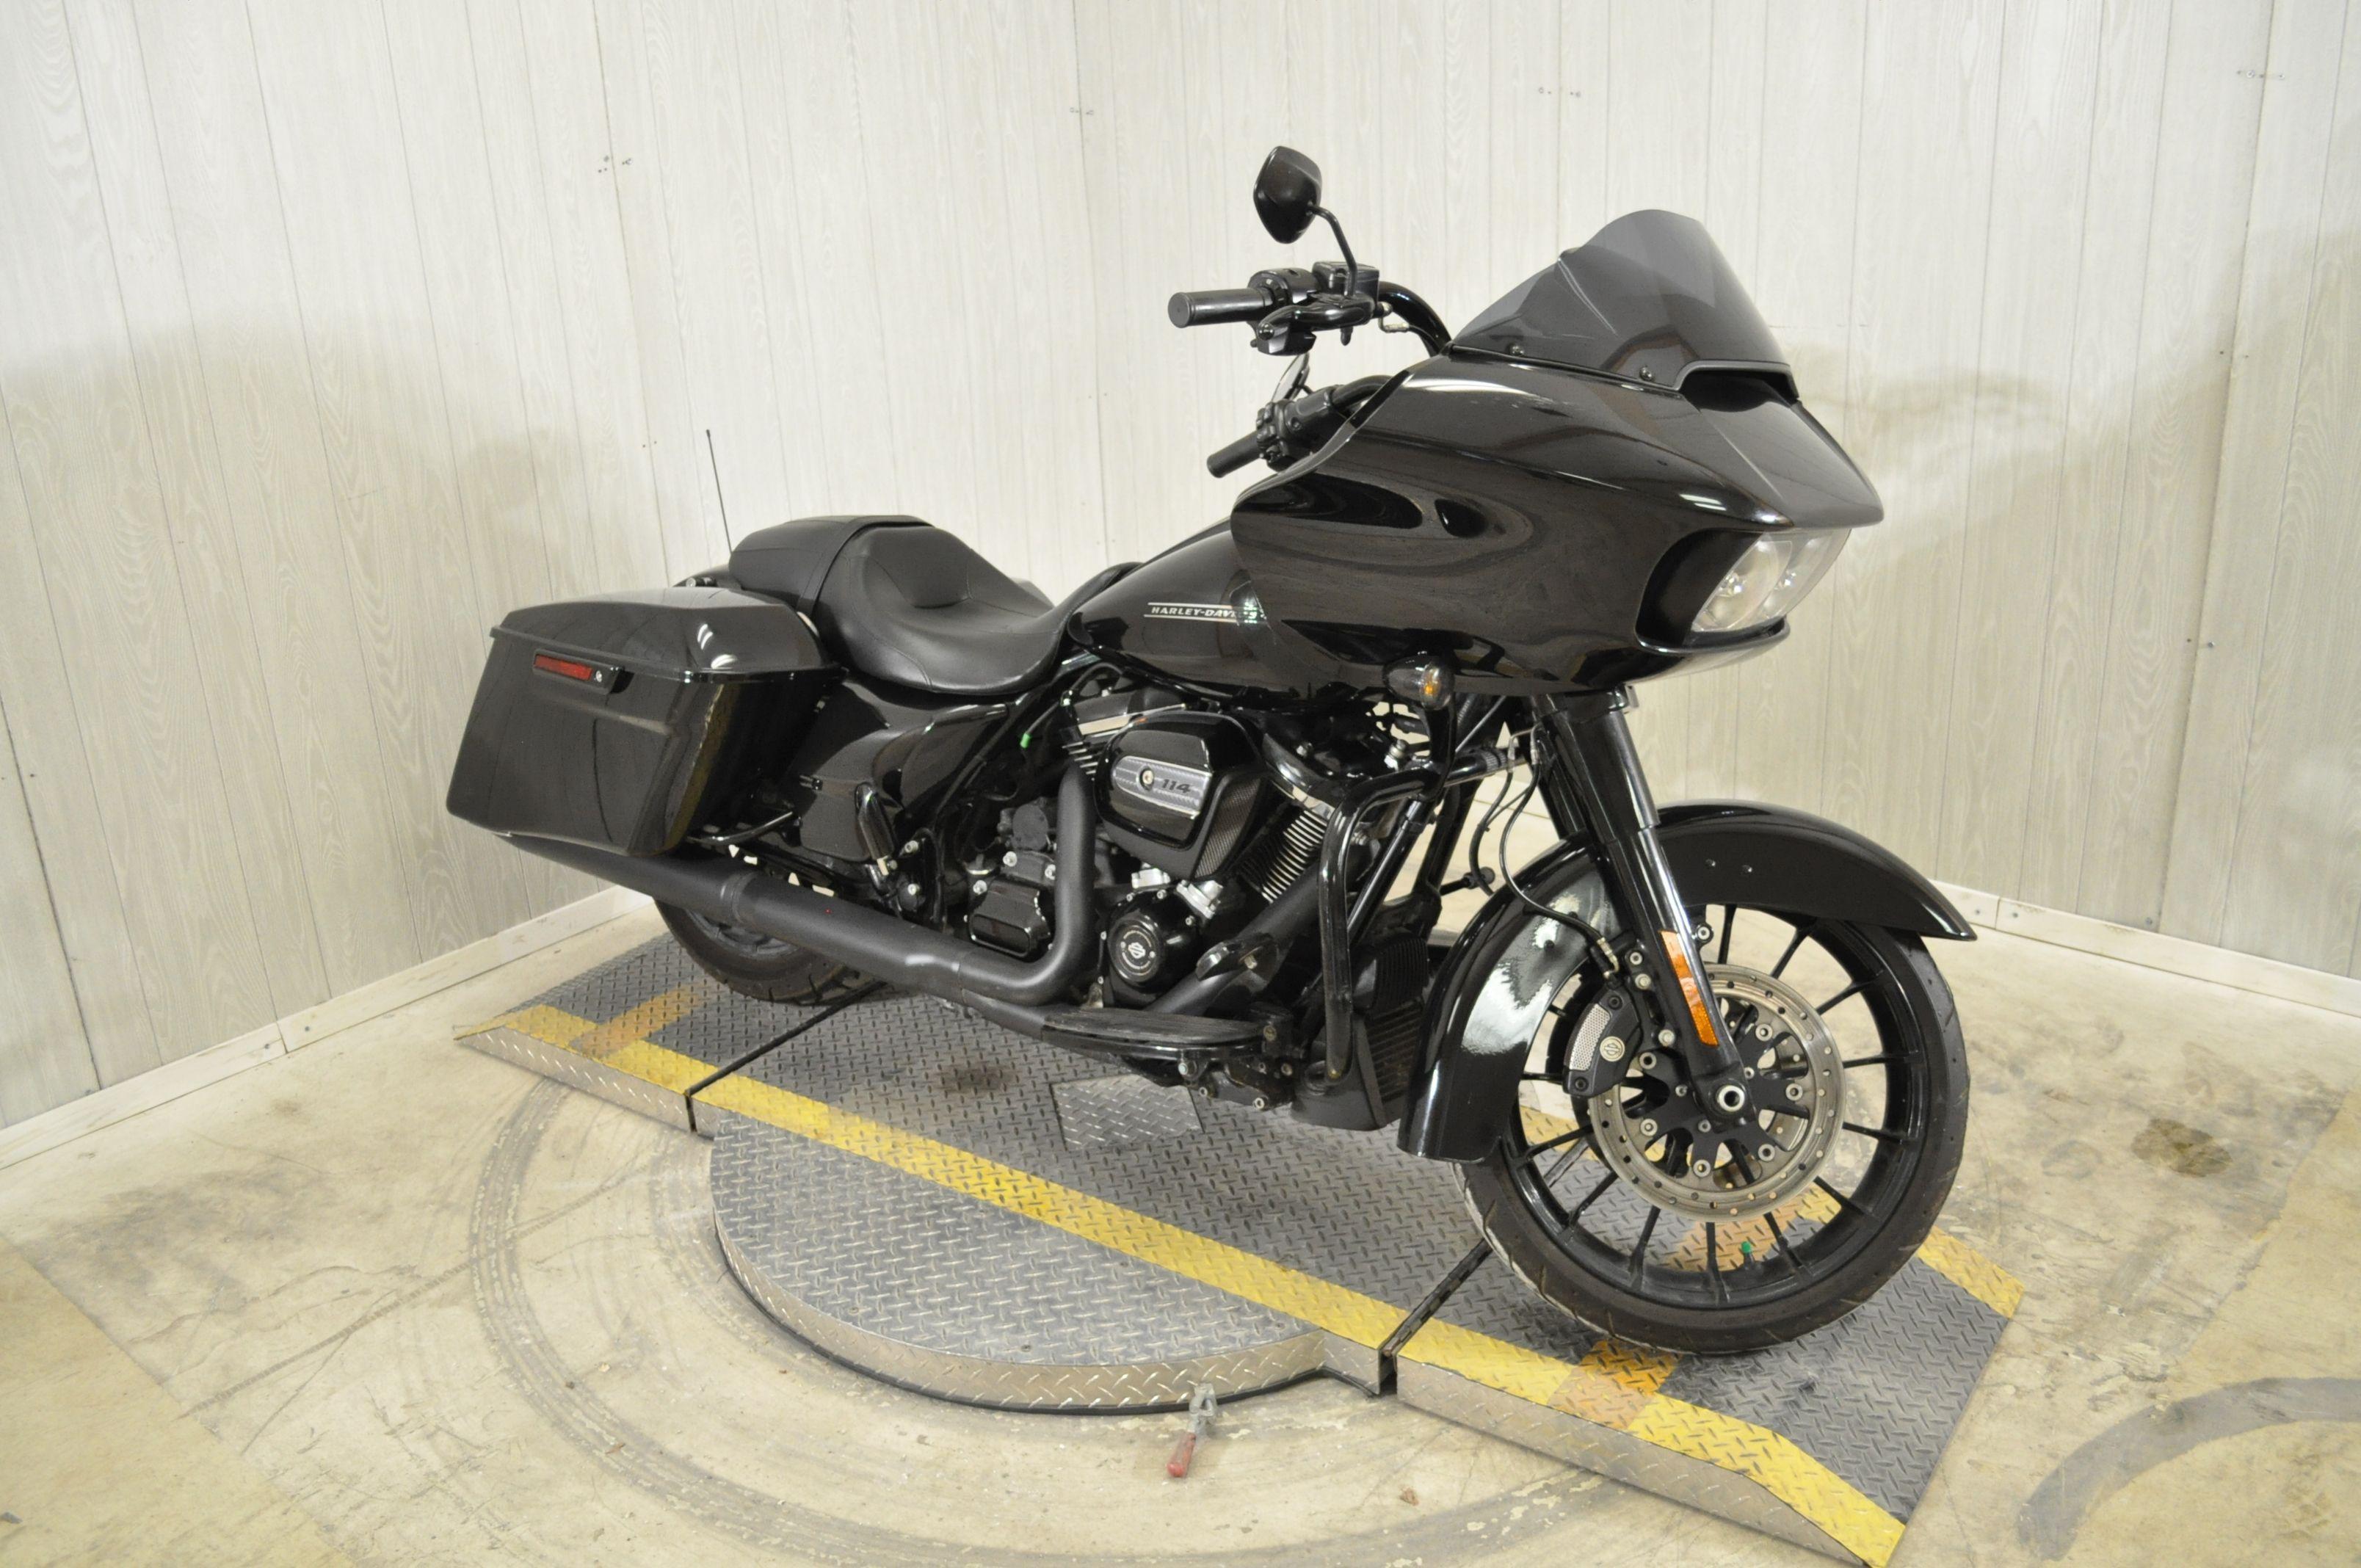 Pre-Owned 2019 Harley-Davidson Road Glide Special FLTRXS